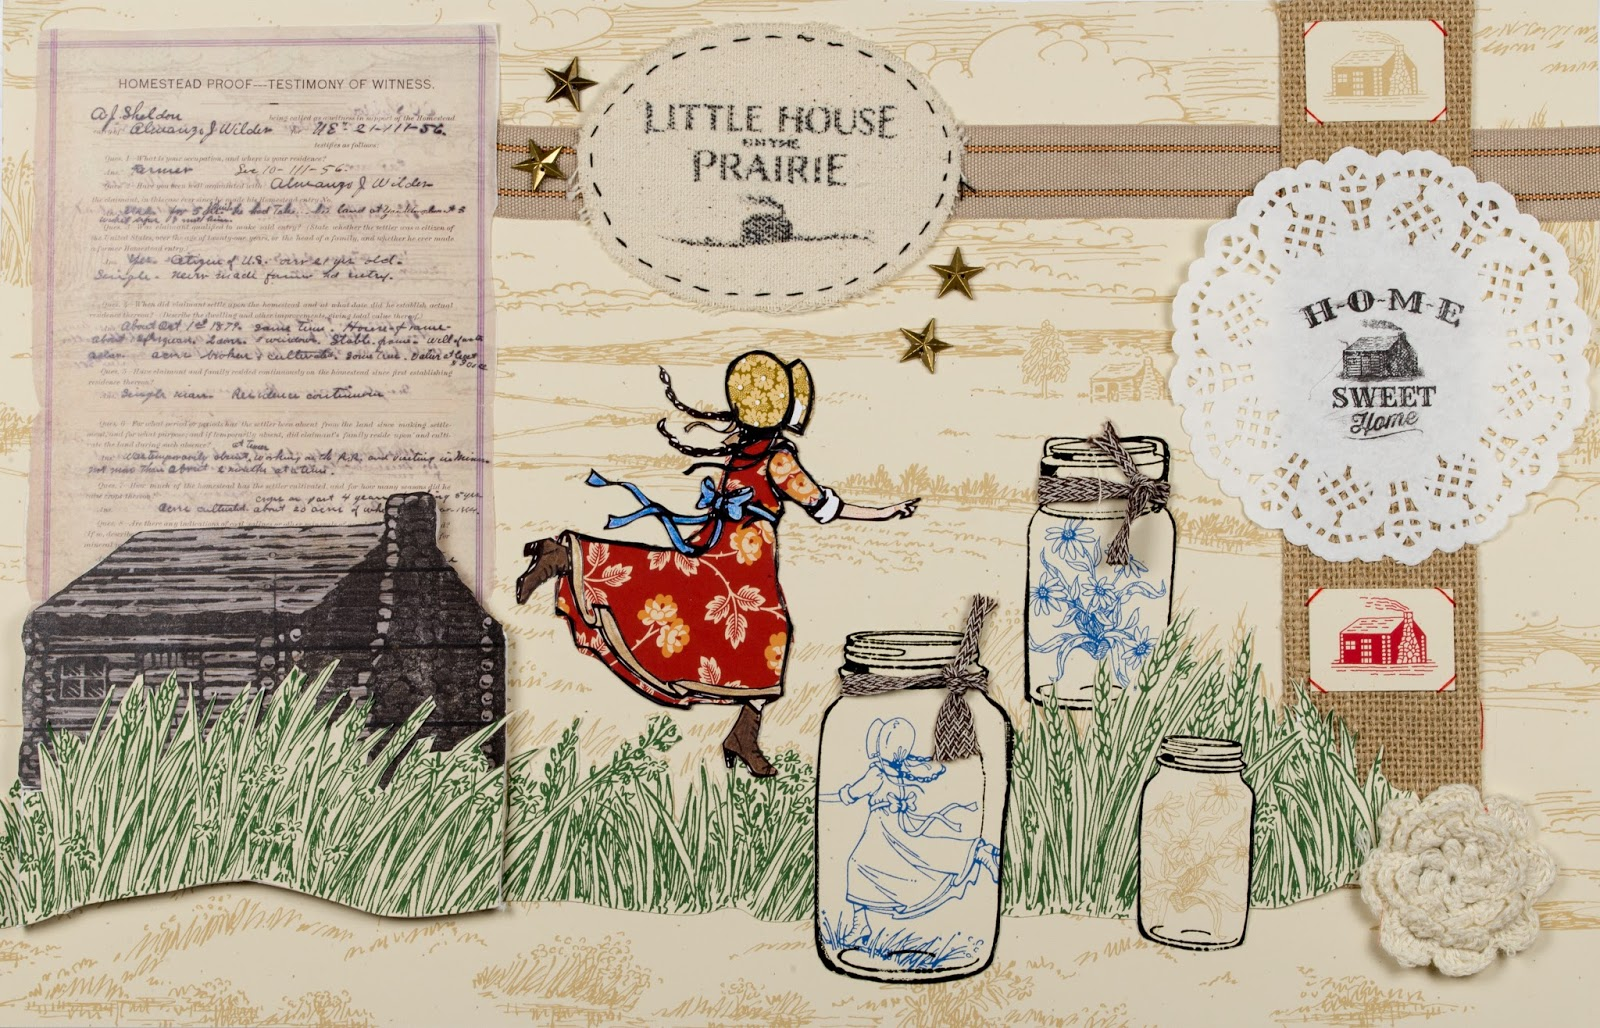 Broadbent's Quilting Chicks: Little House on the Prairie : prairie quilts - Adamdwight.com